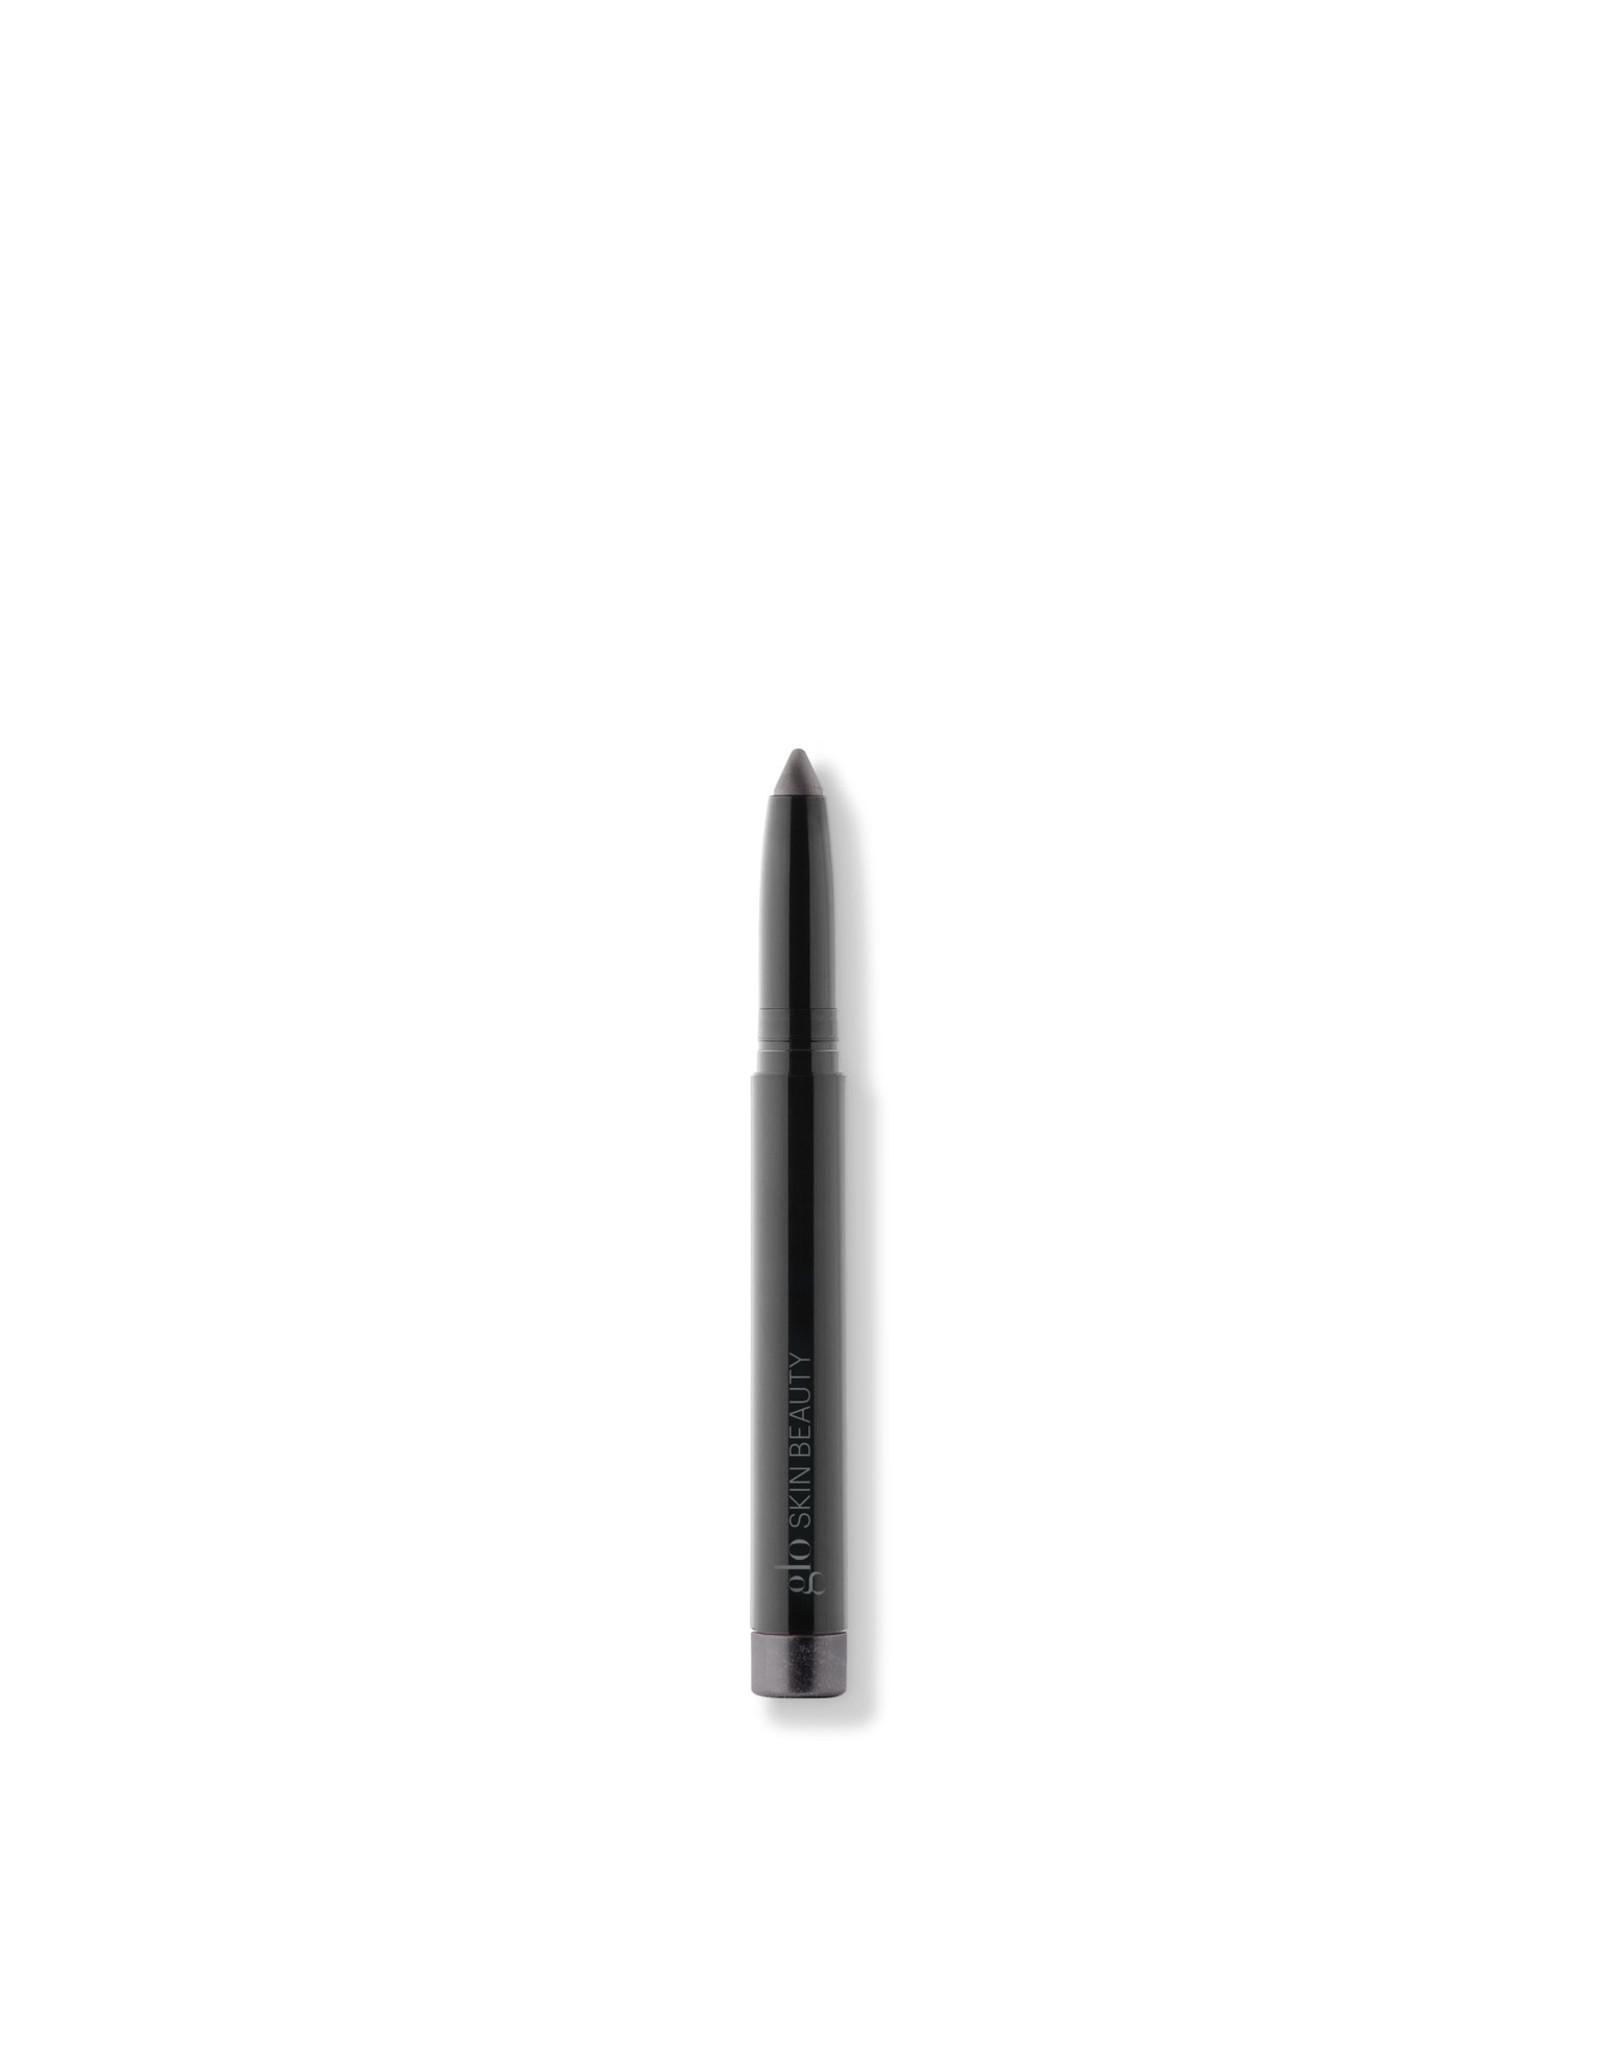 Glo Skin Beauty Cream Stay Shadow Stick